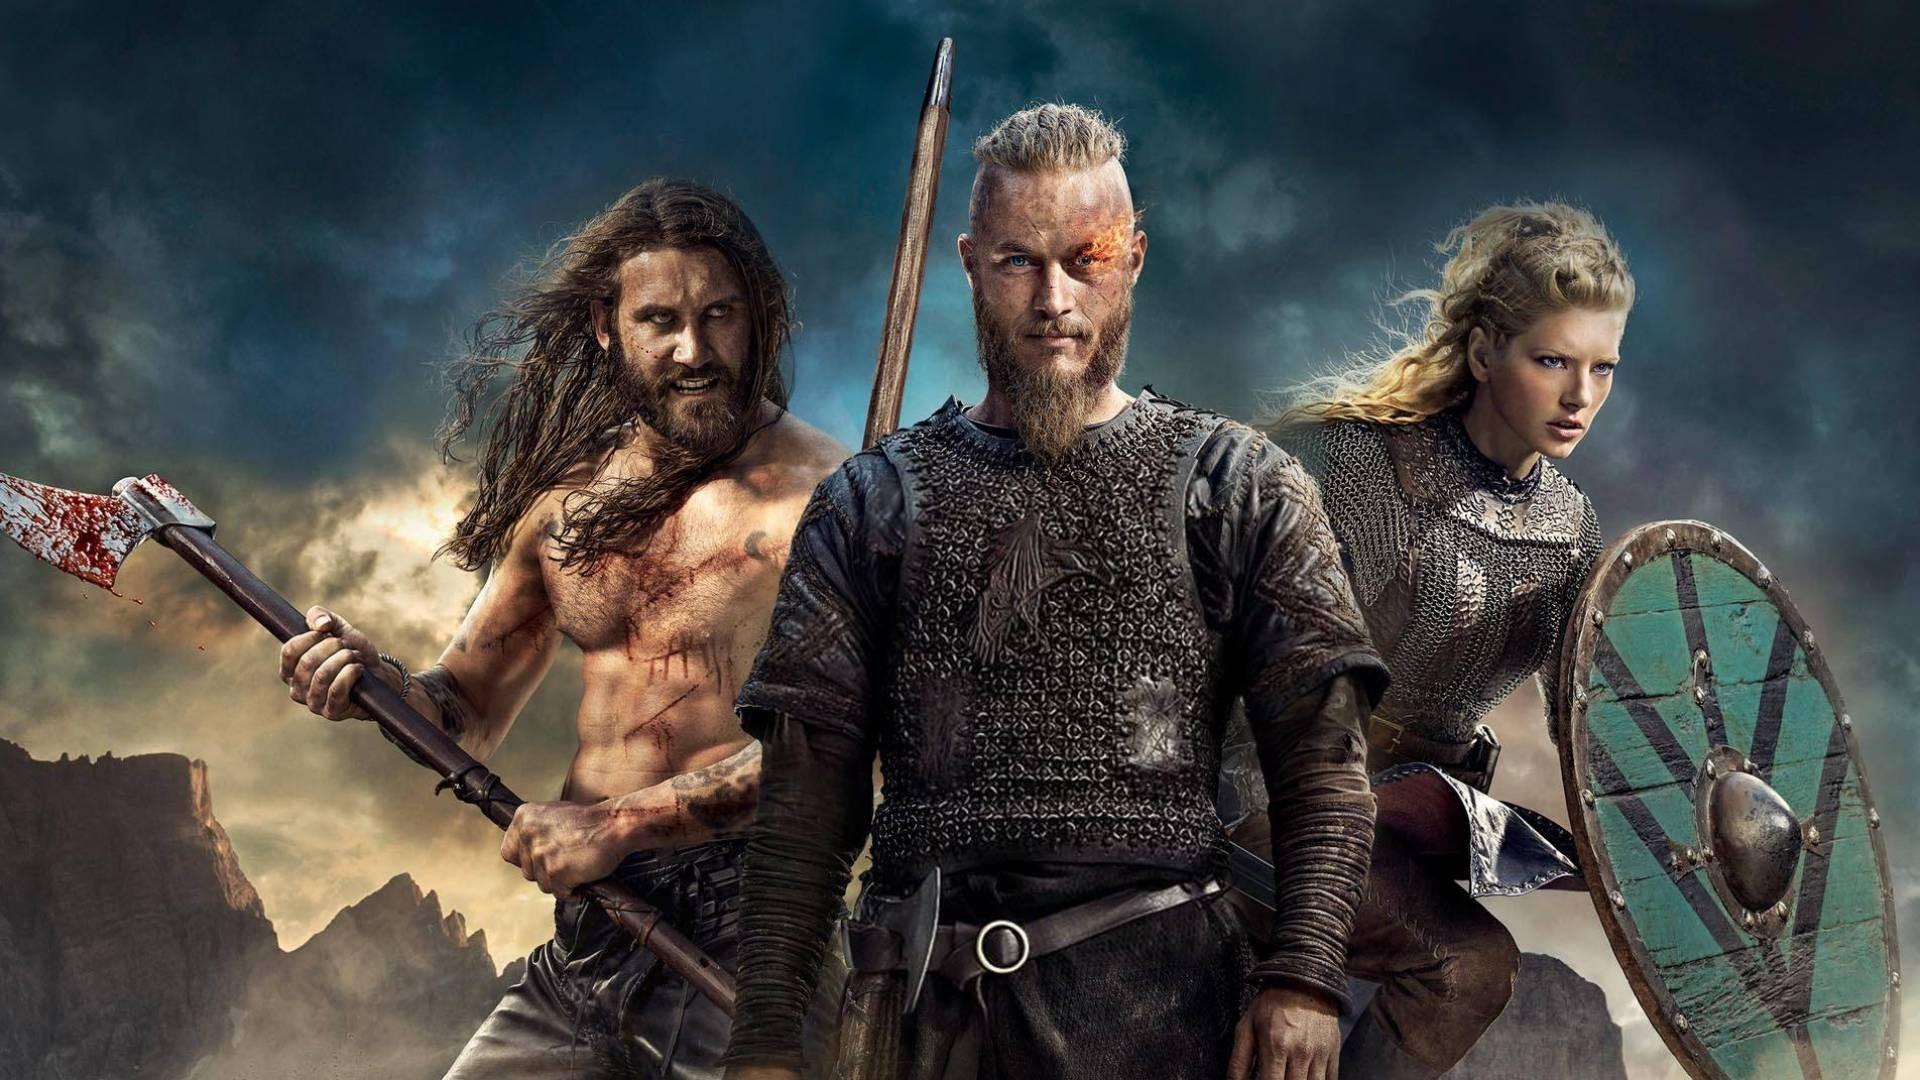 Clive Standen (Rollo) – Vikings (2014) – Metek Artwork (2016) | Wallpaper:  Top Quality Image | Pinterest